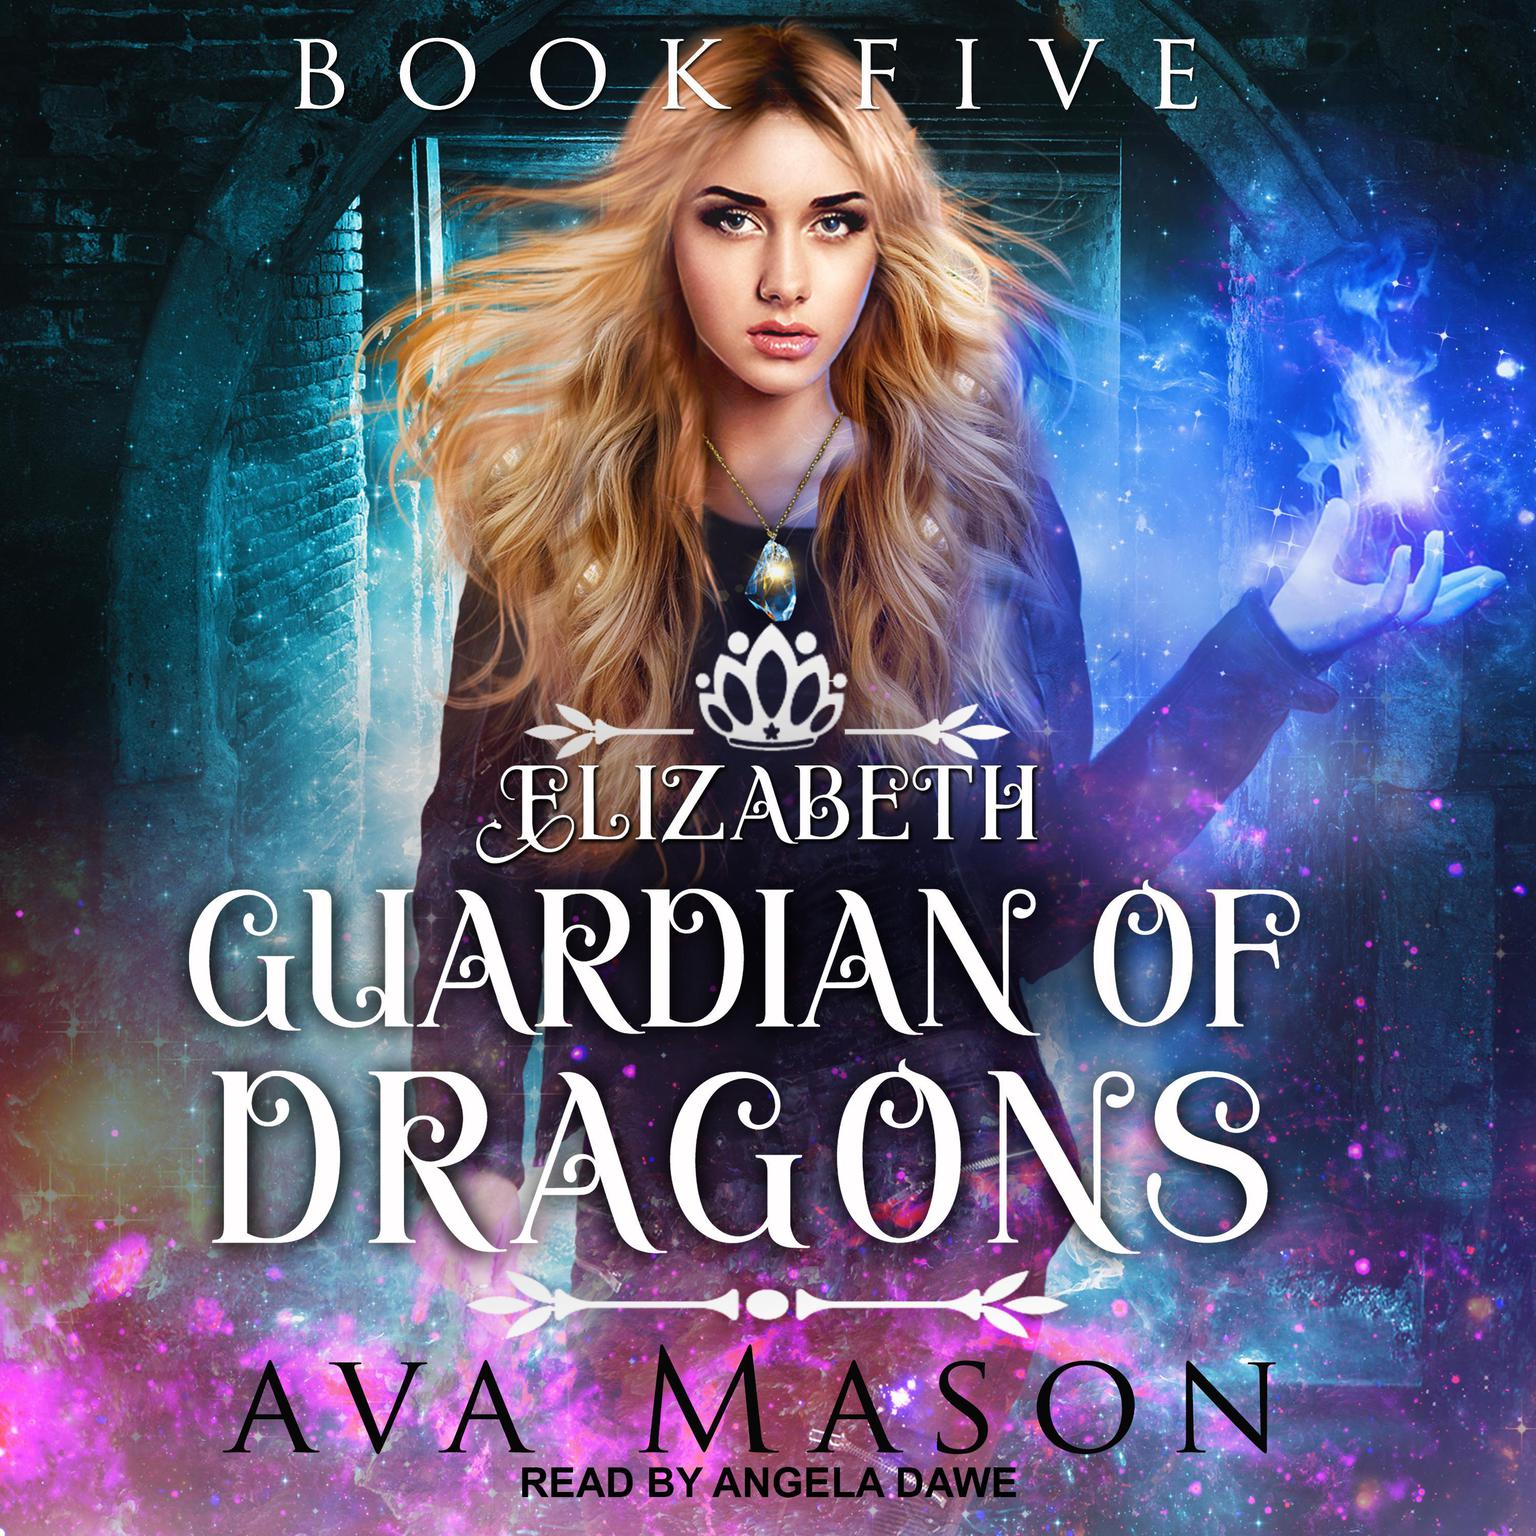 Printable Elizabeth, Guardian of Dragons: A Reverse Harem Paranormal Romance Audiobook Cover Art